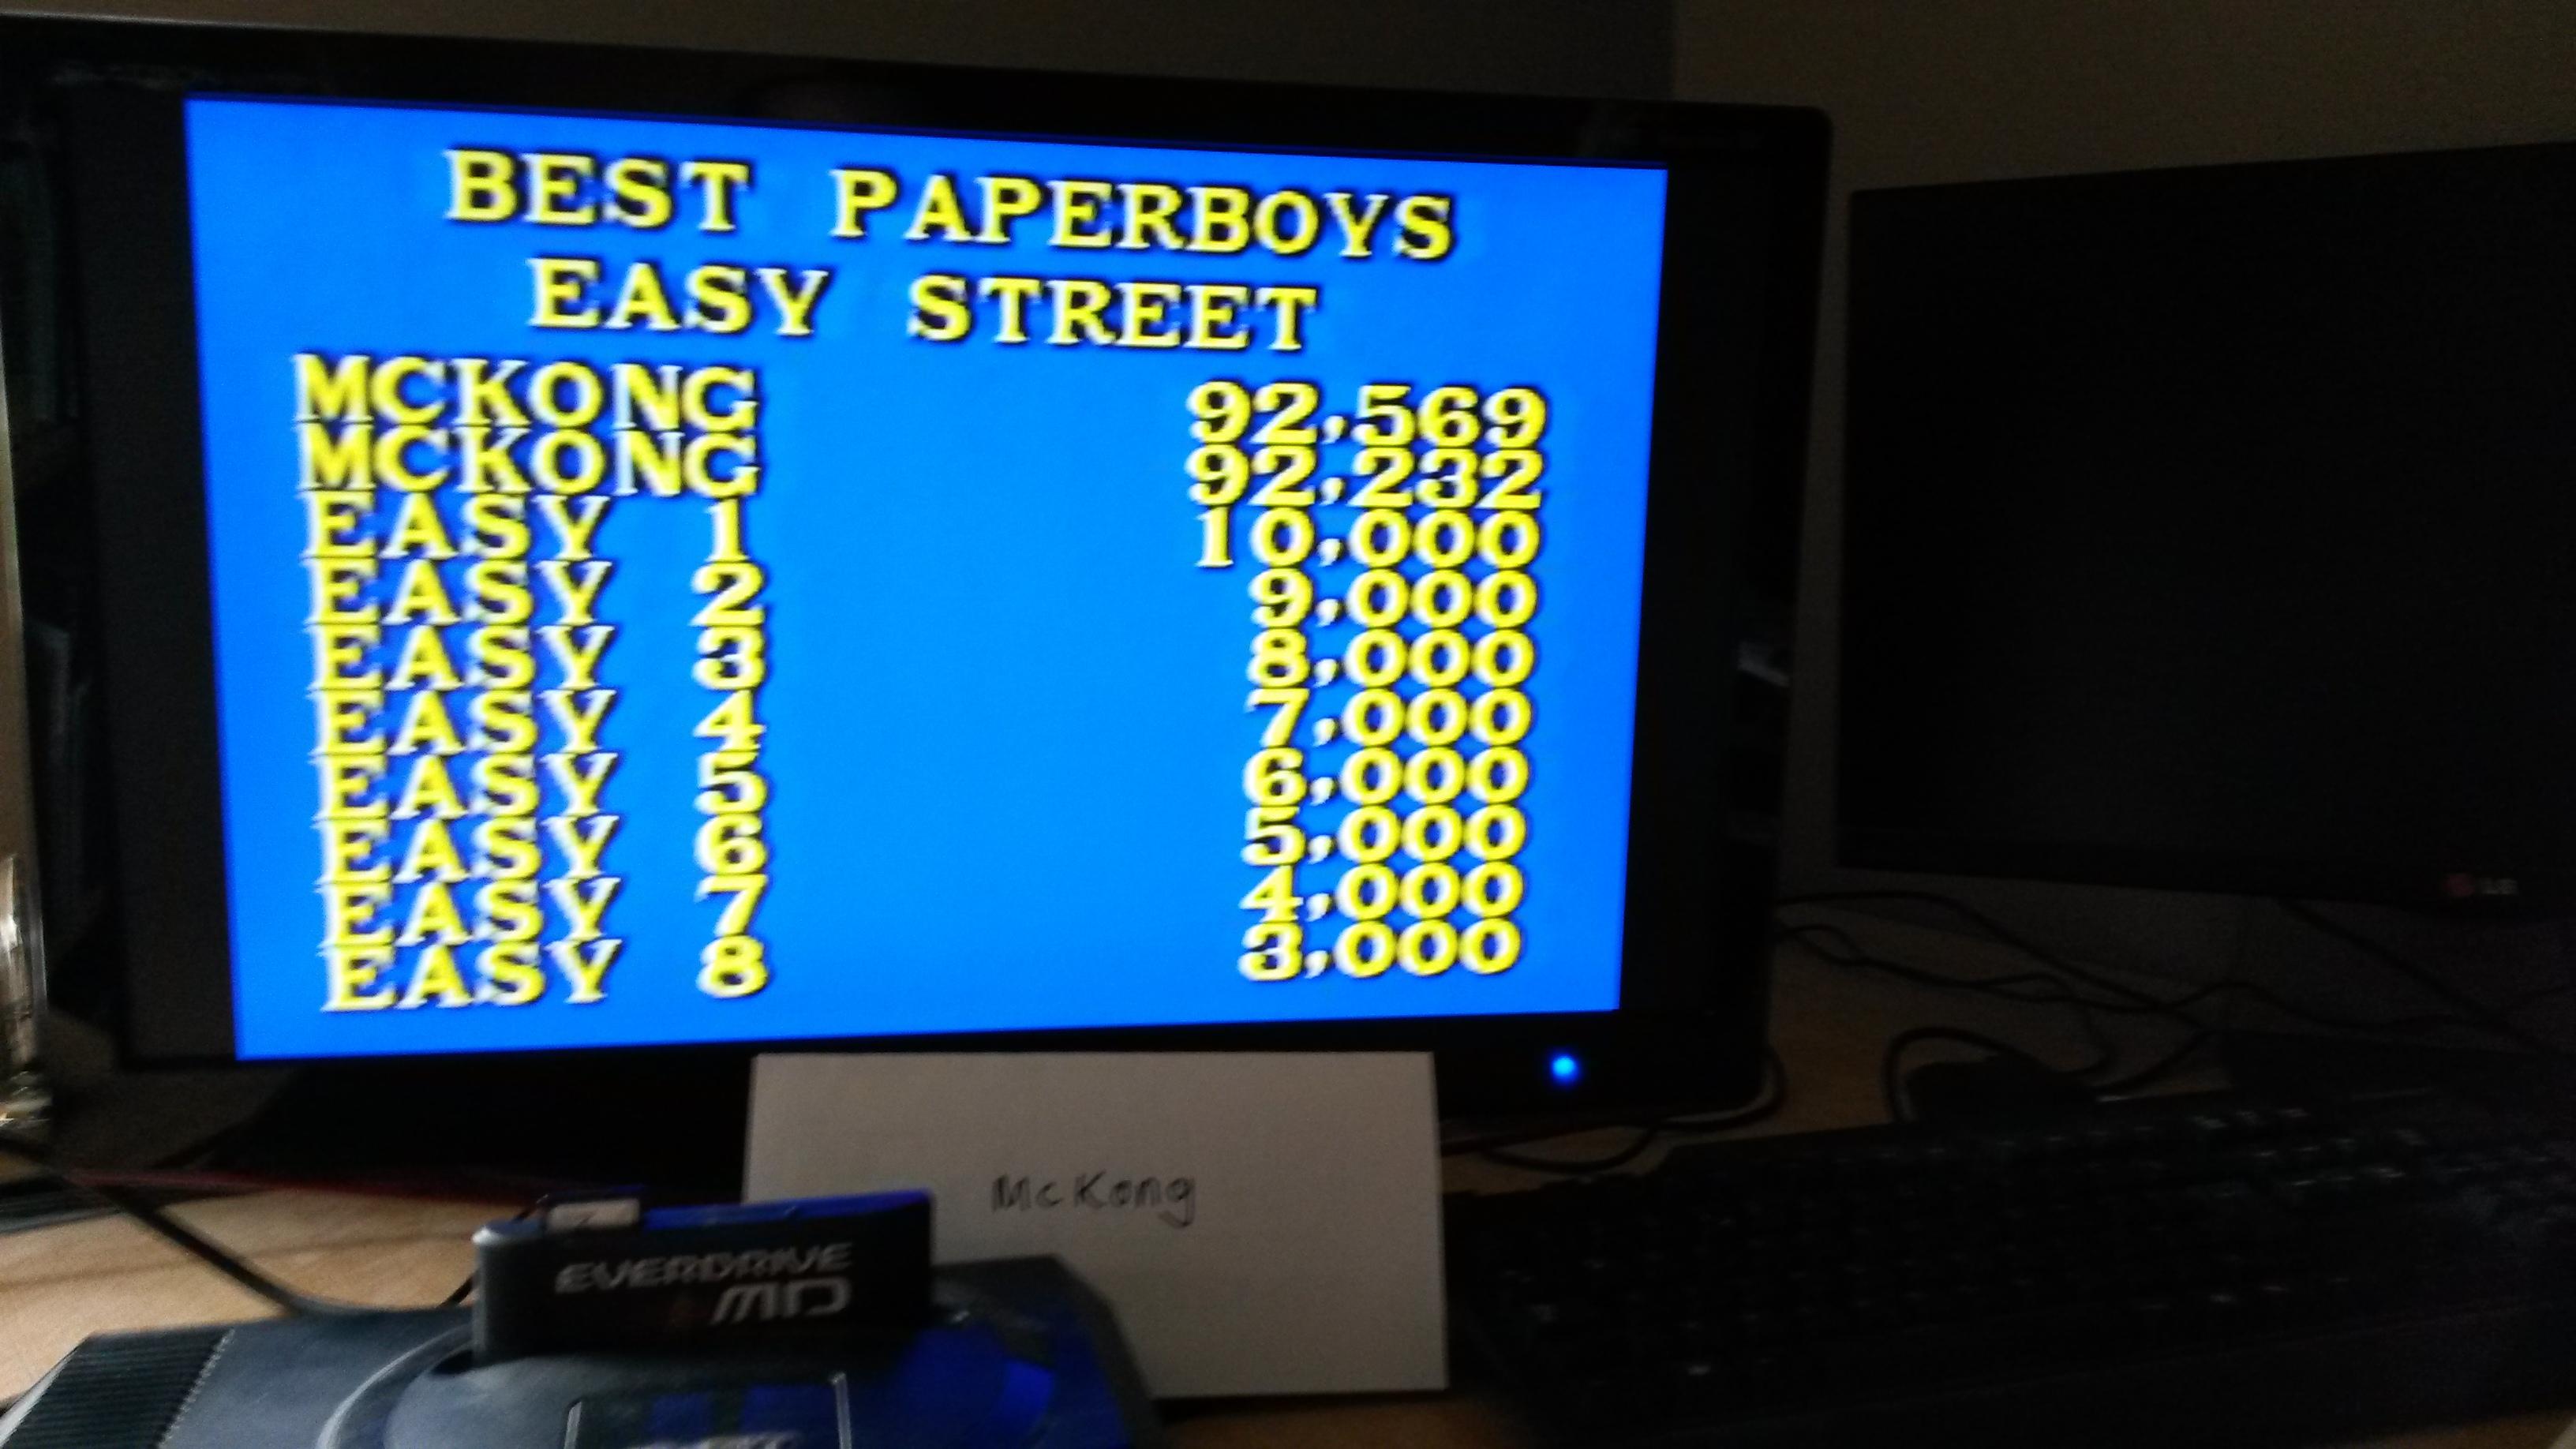 Paper Boy: Easy St [Medium]